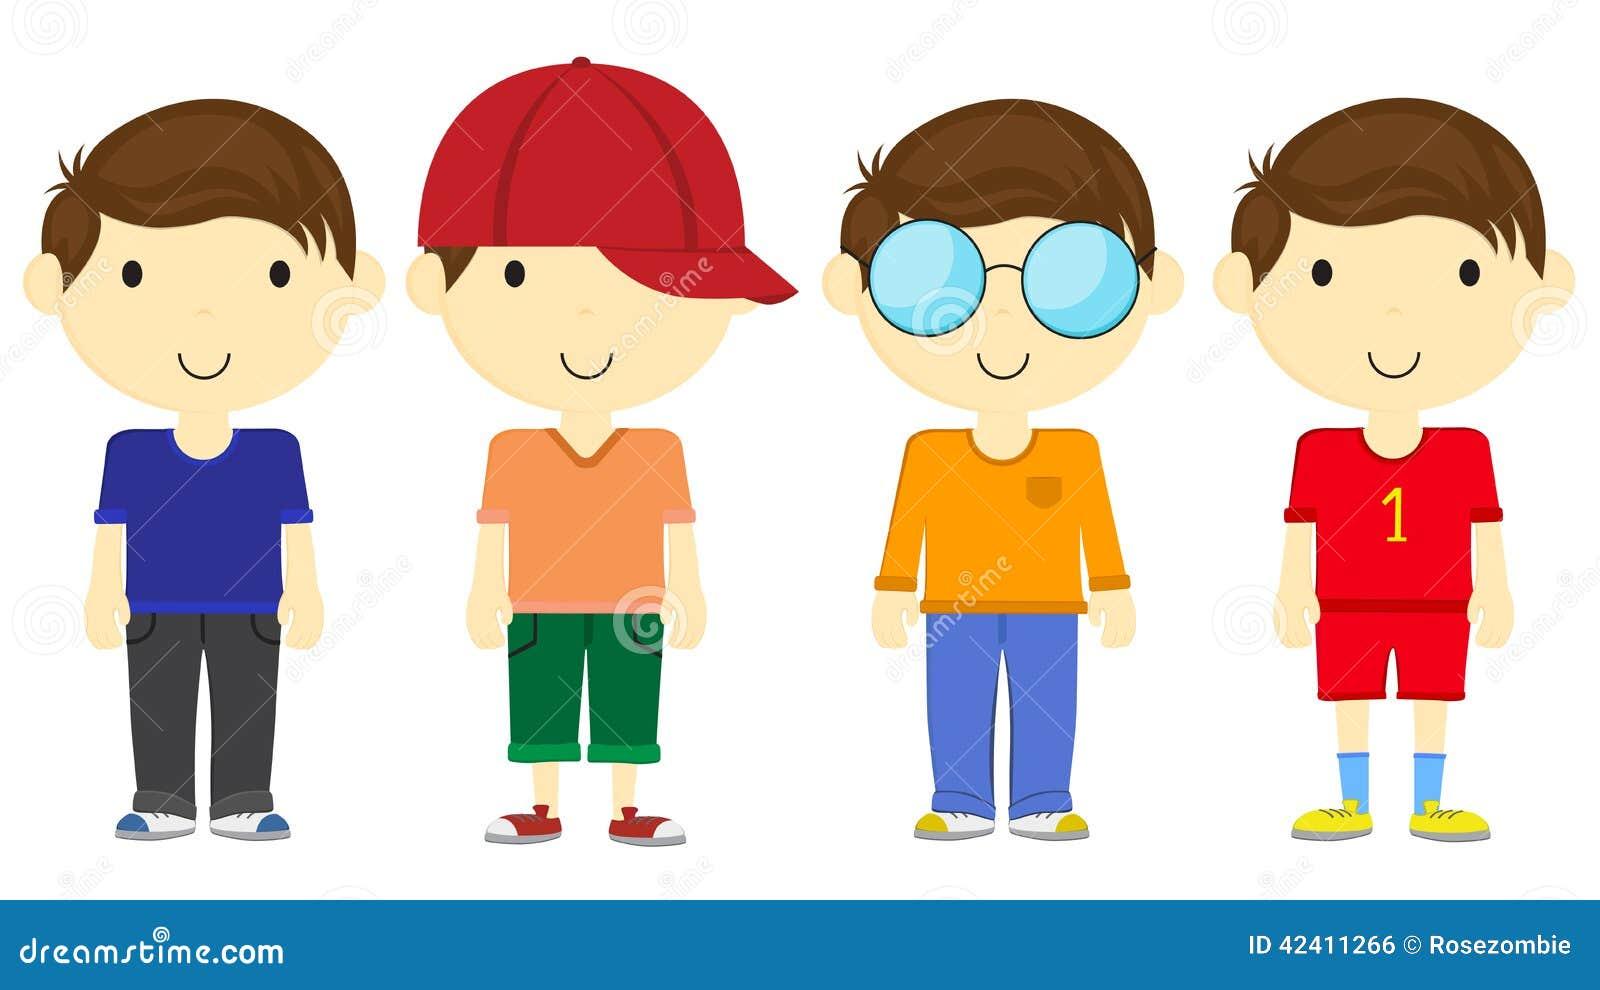 Cartoon boy stock illustration. Image of student, teenager ...